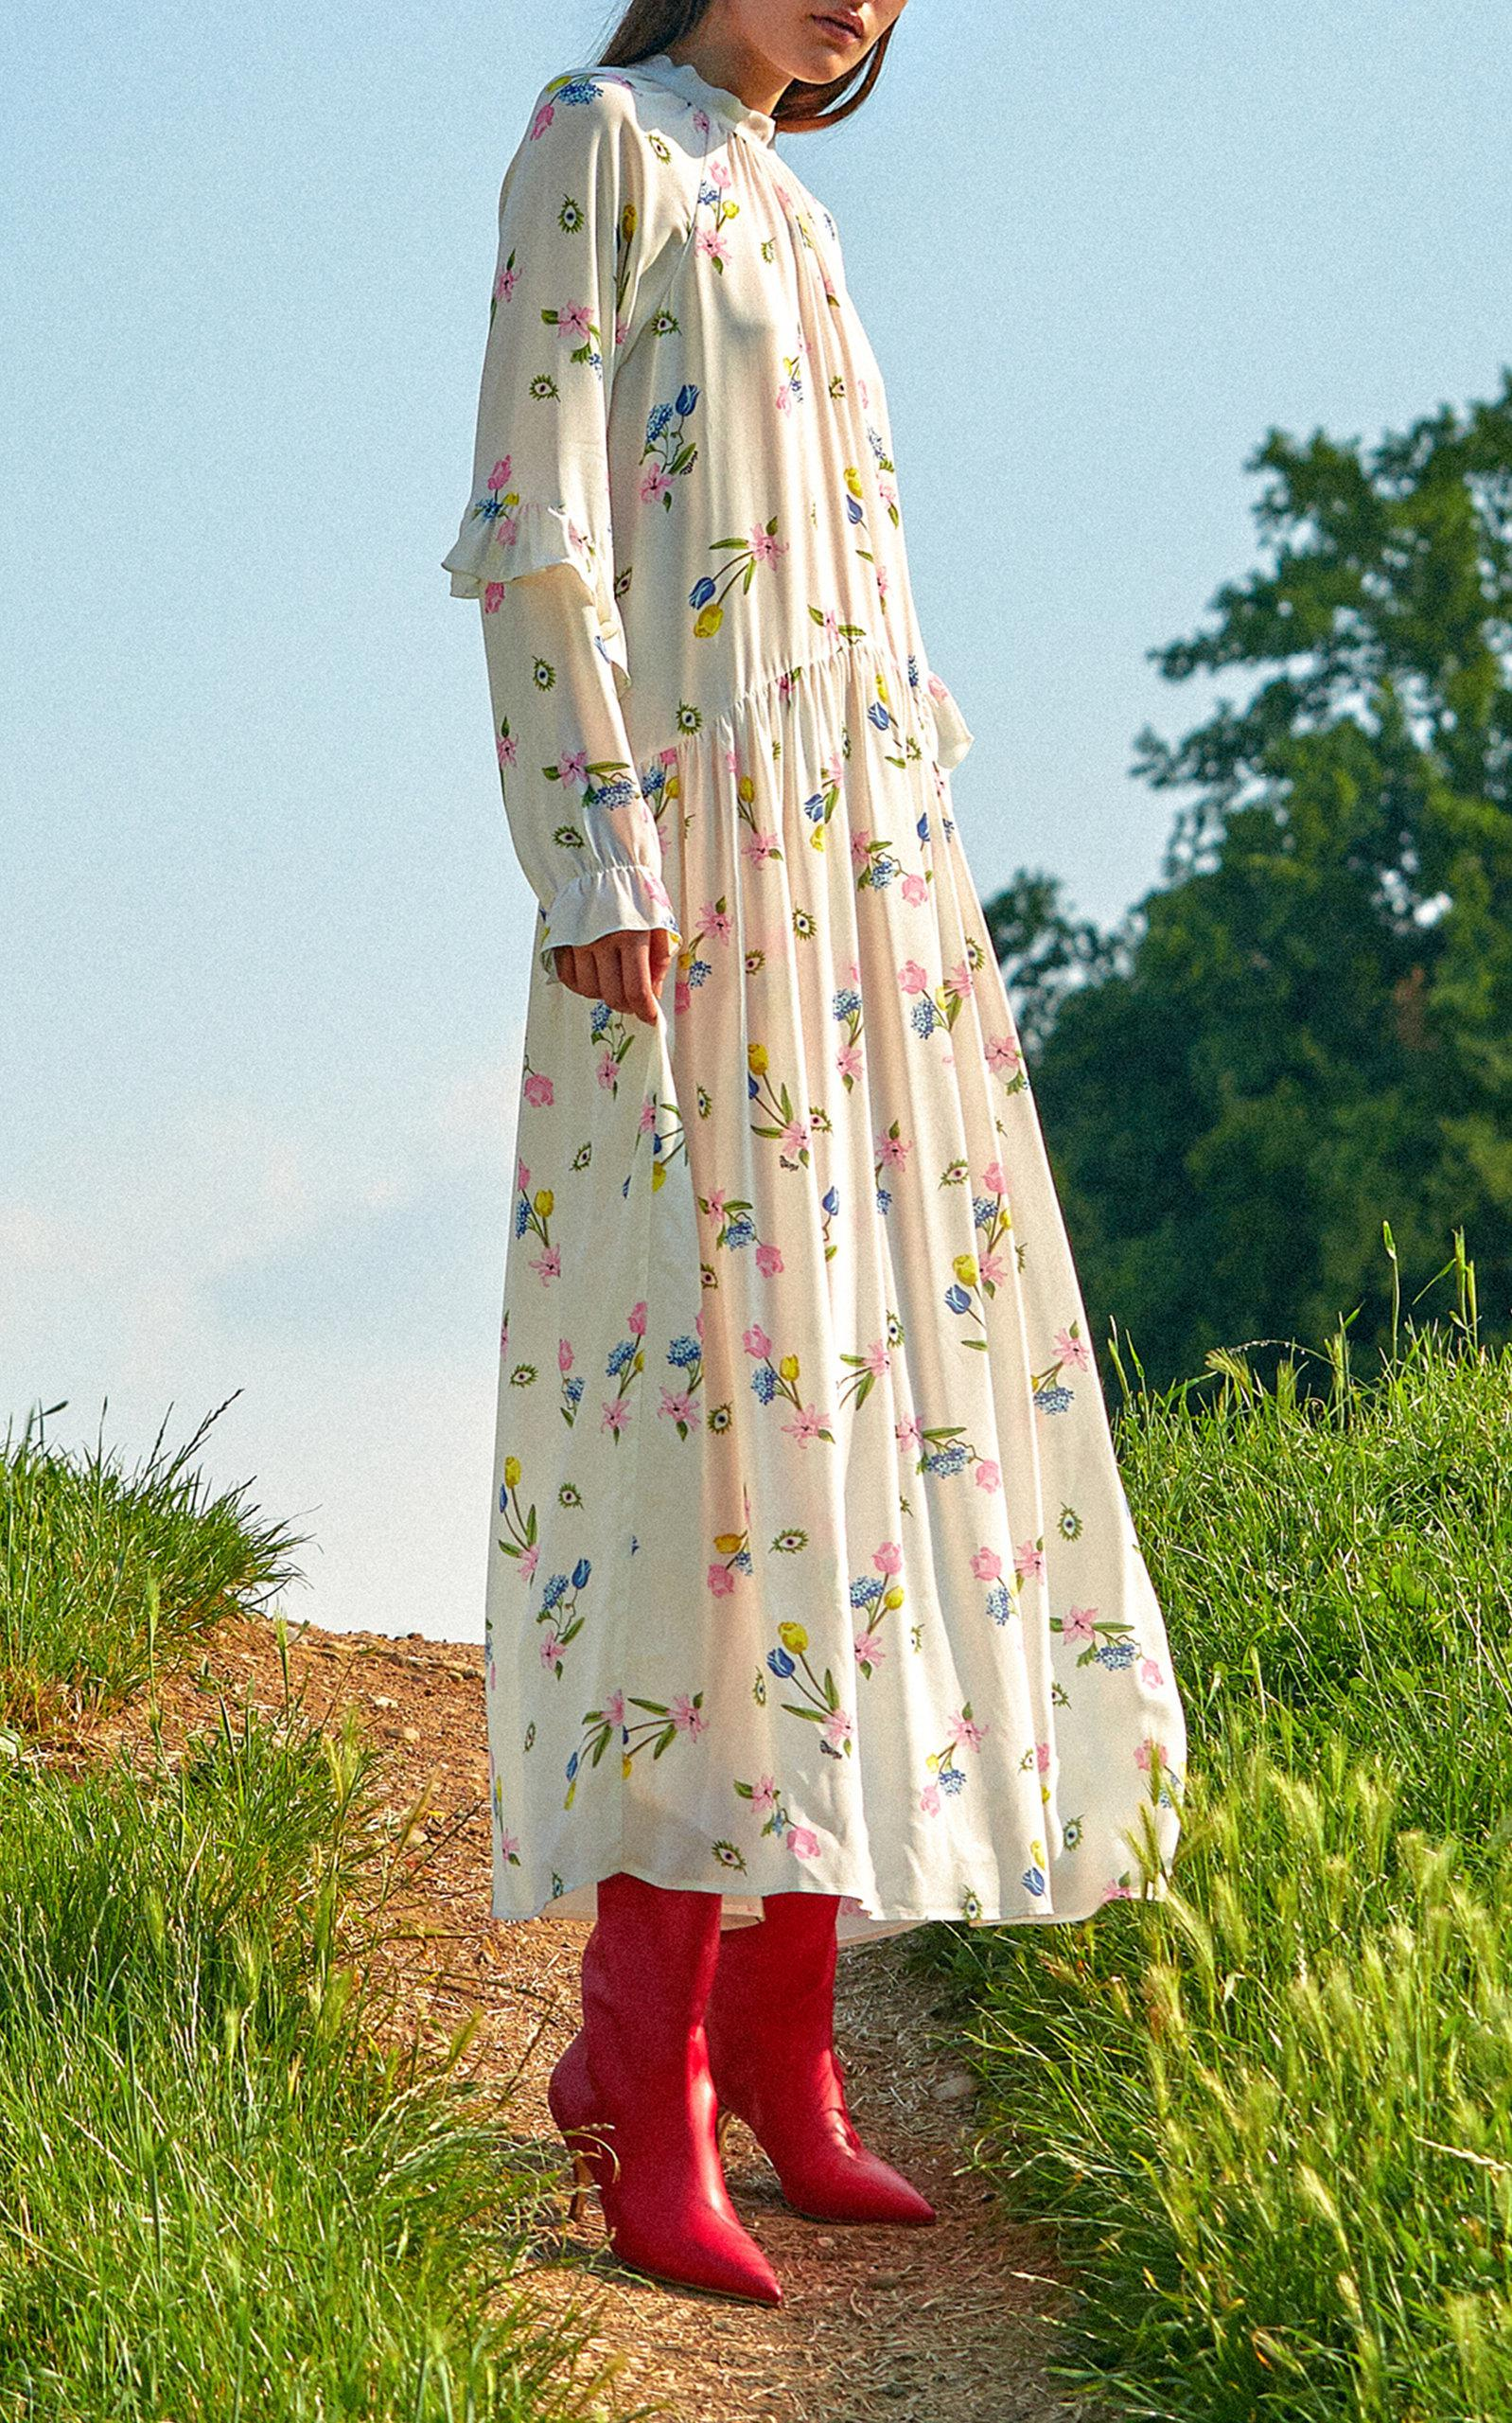 Savona Peasant Maxi Dress Vivetta Limited New Styles For Sale 3H5JKm